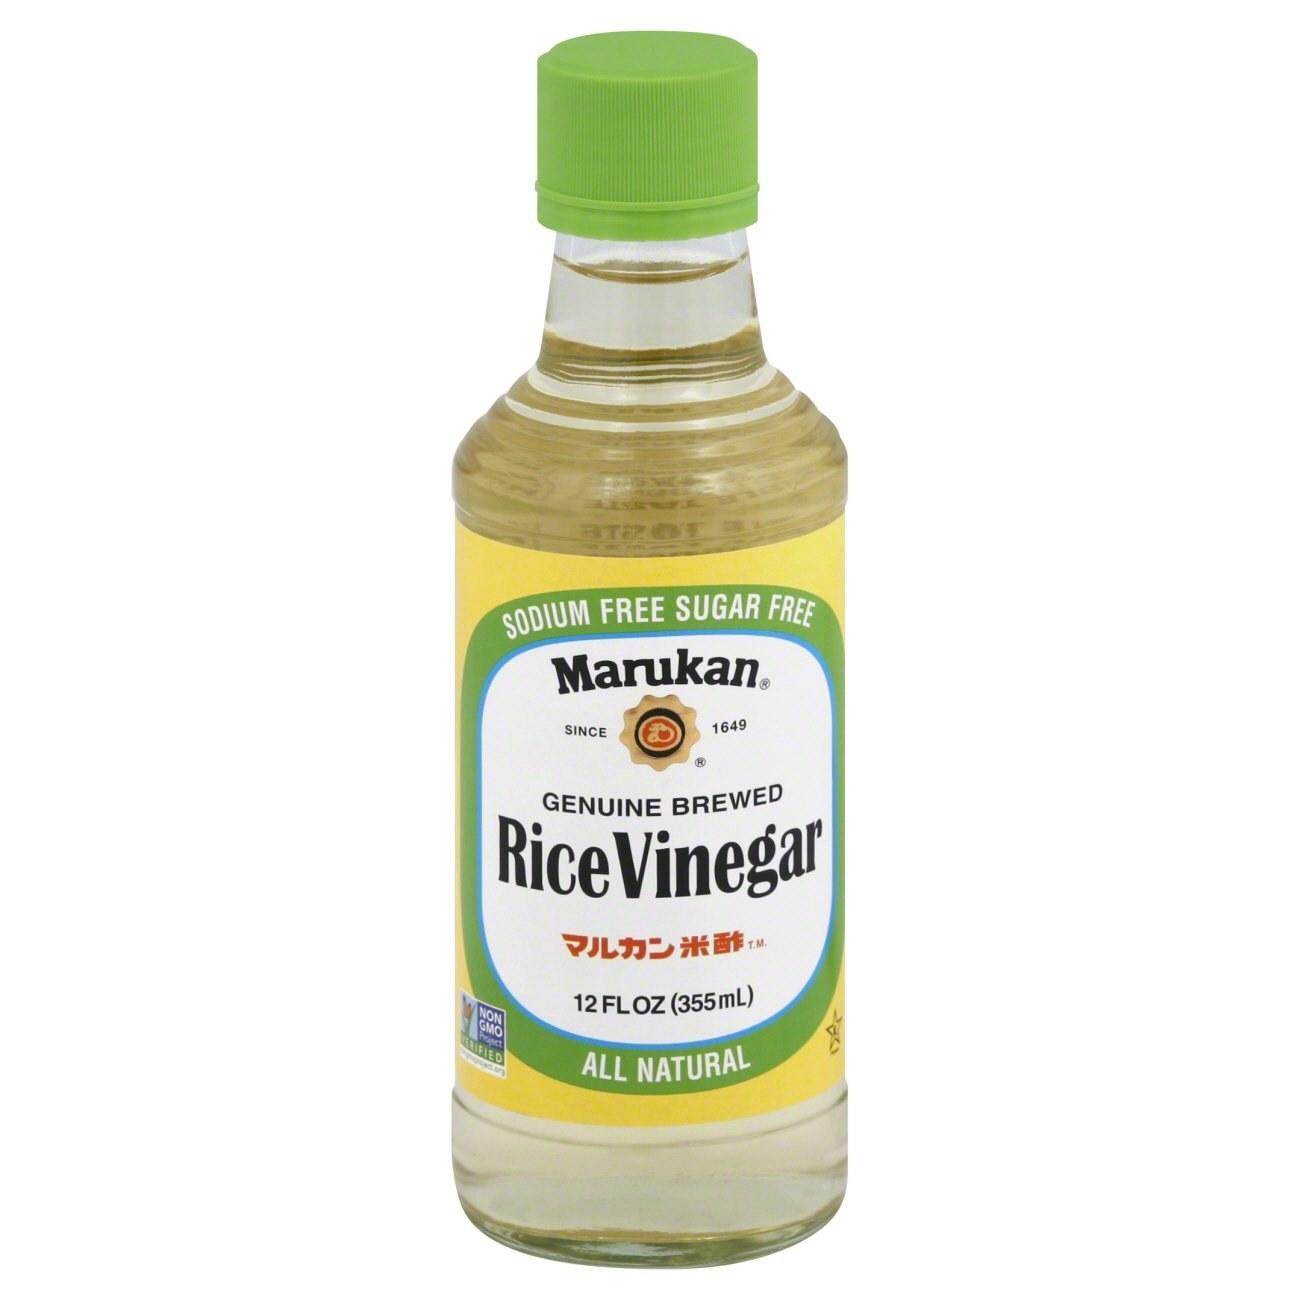 A bottle of Marukan rice vinegar.